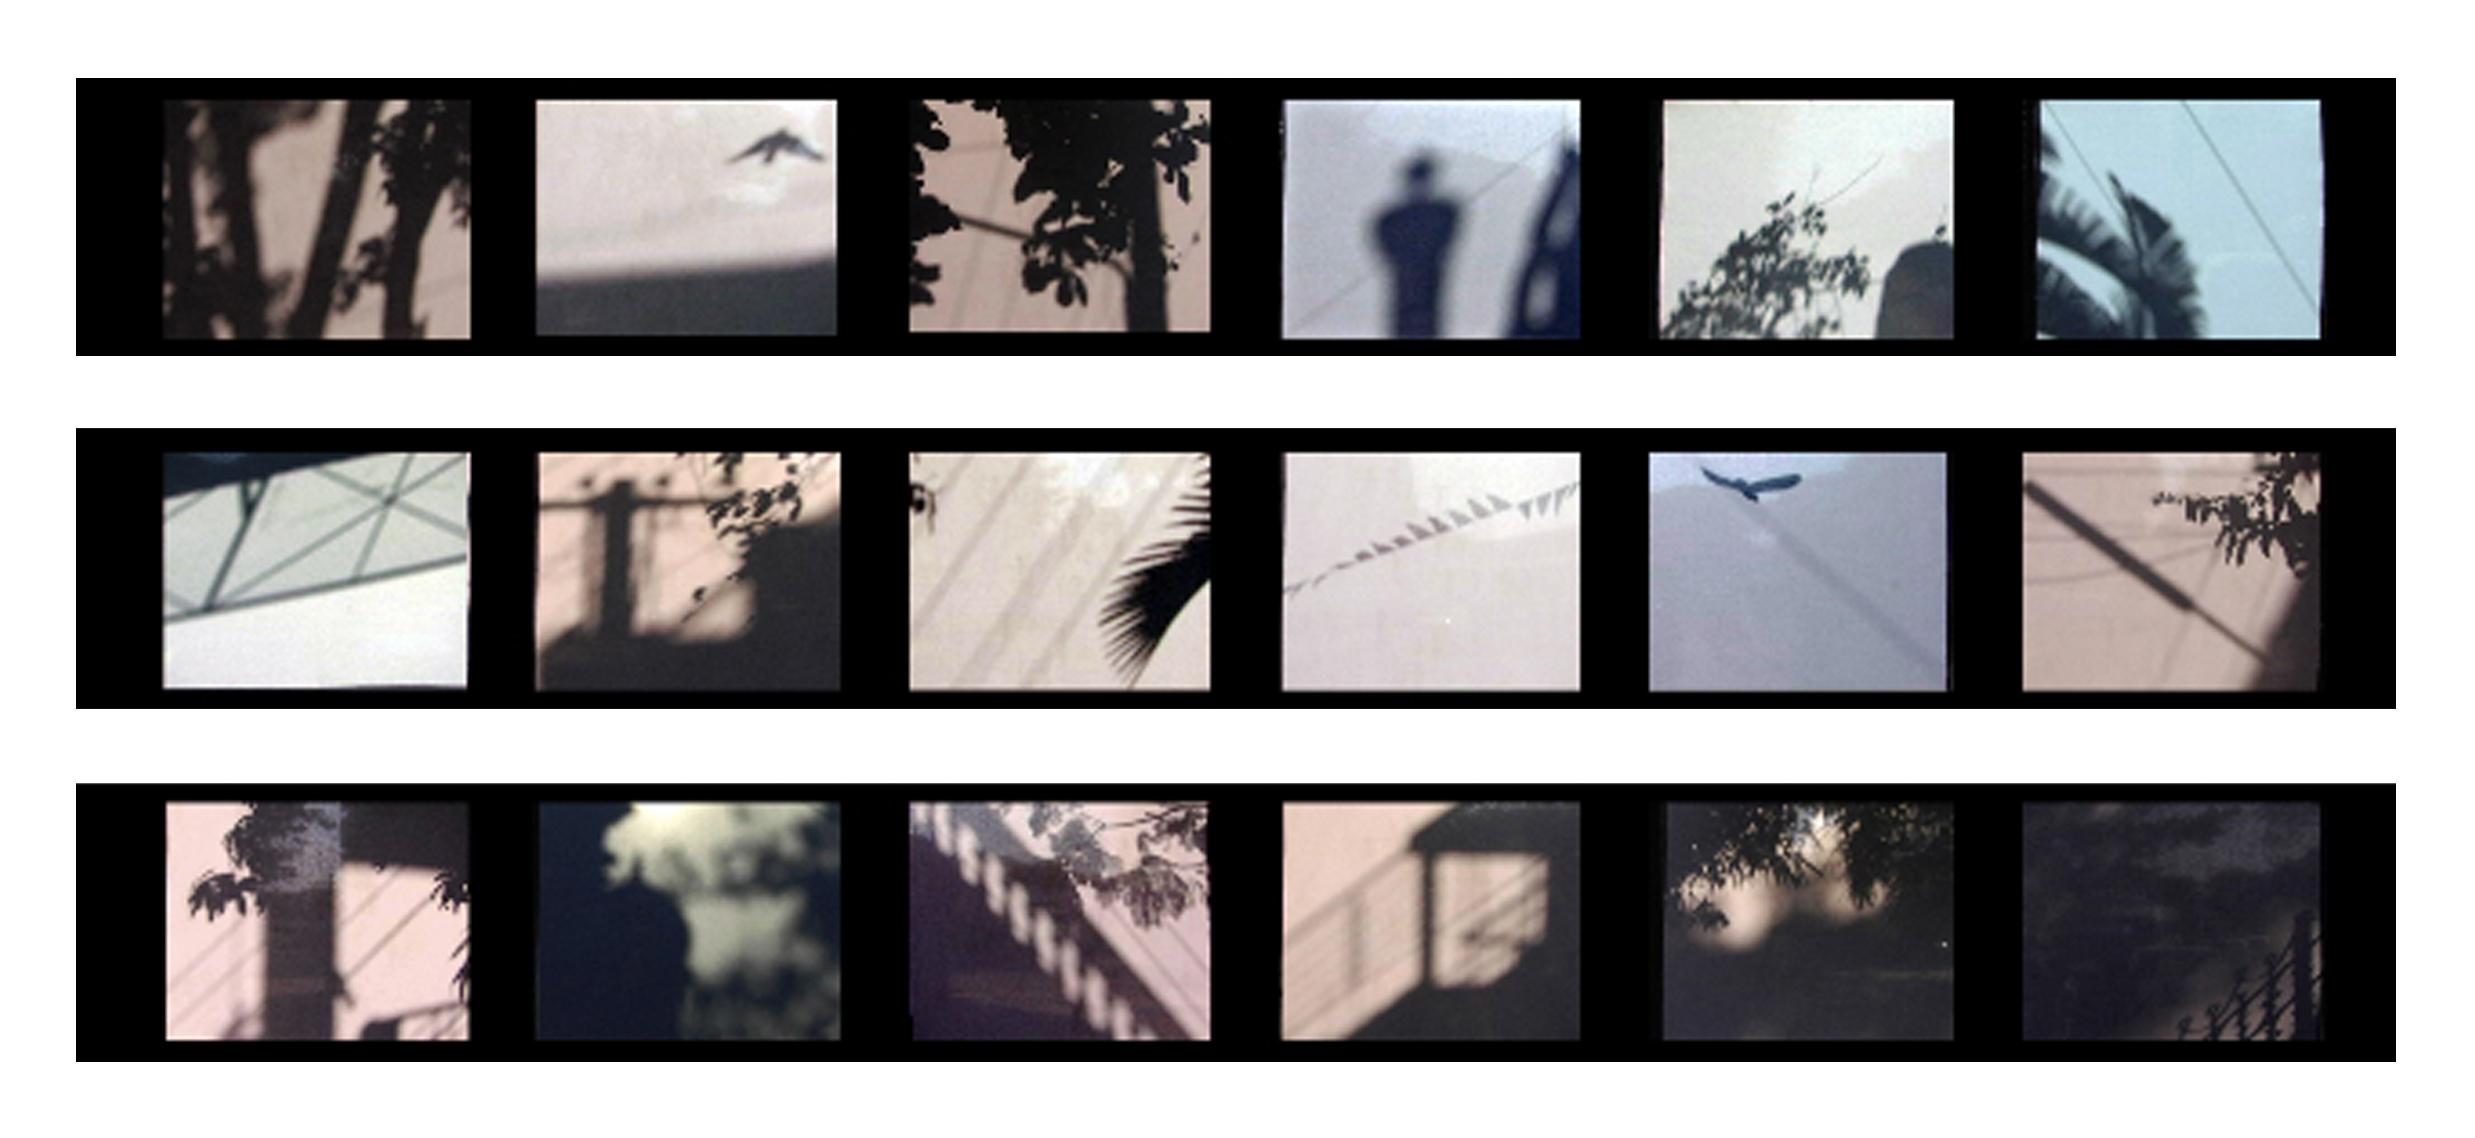 Bangalore as Shadows